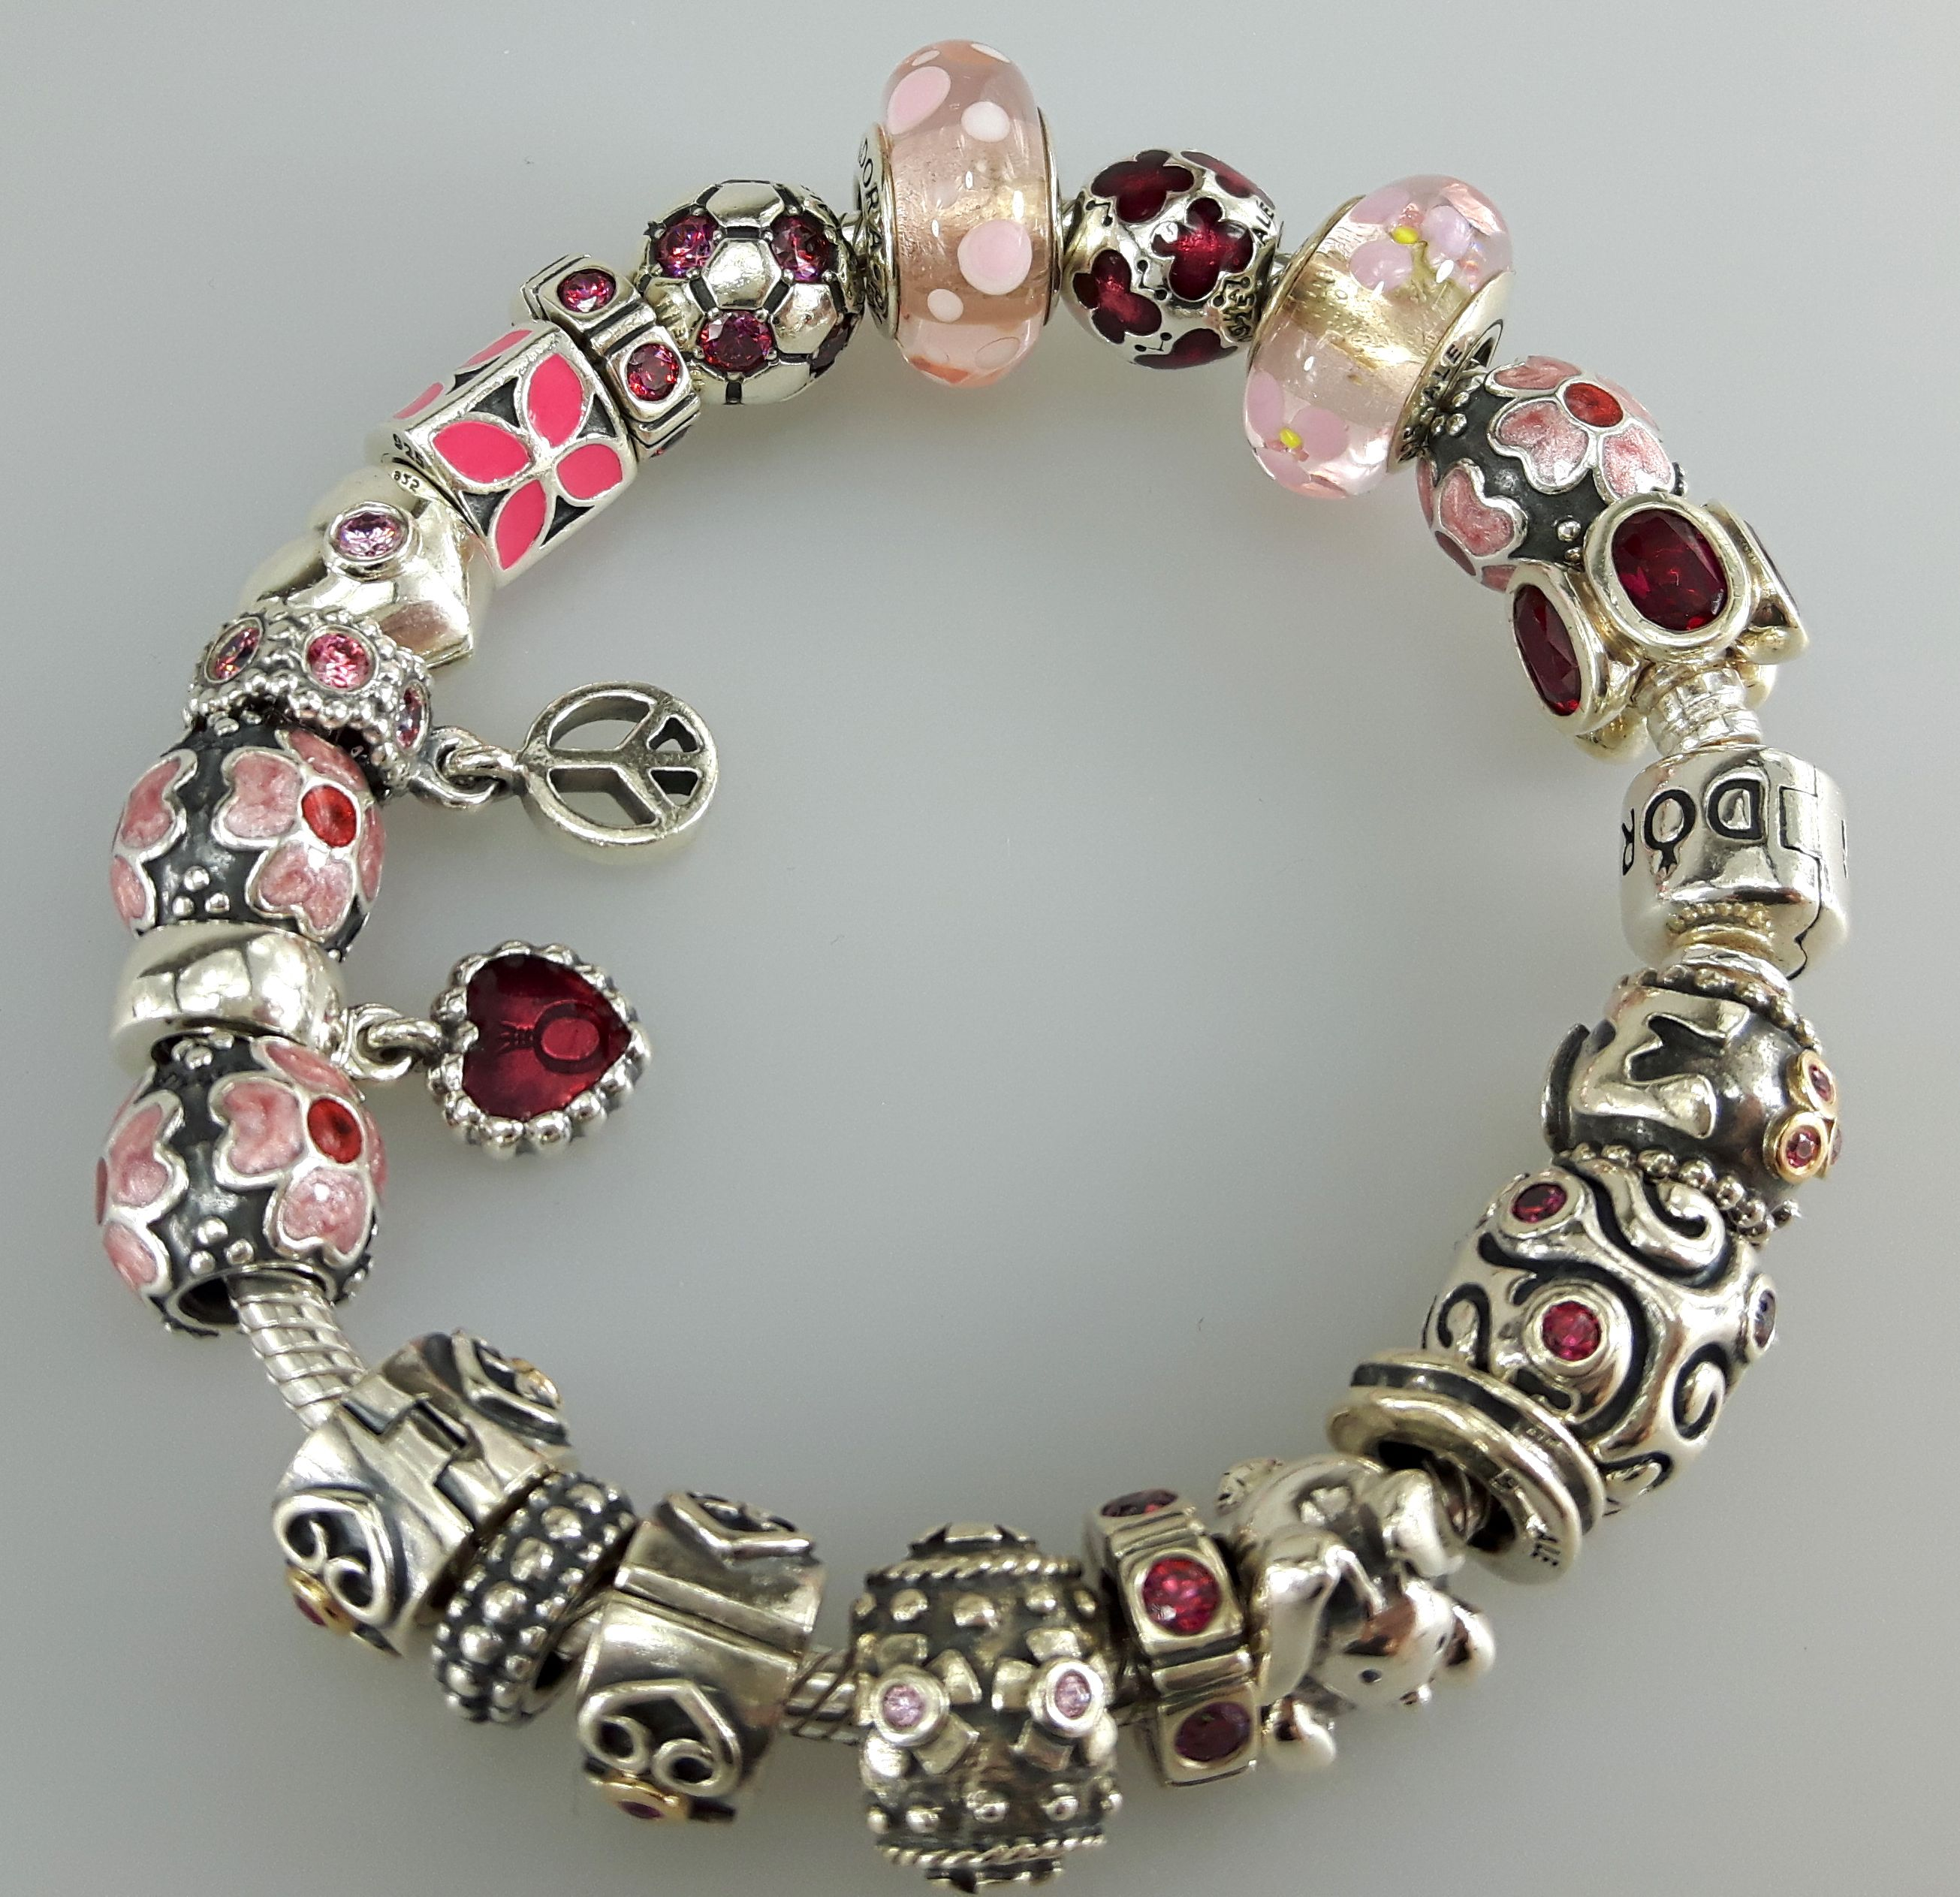 Who Sells Pandora Jewelry: Sell Pandora Jewelry With Us